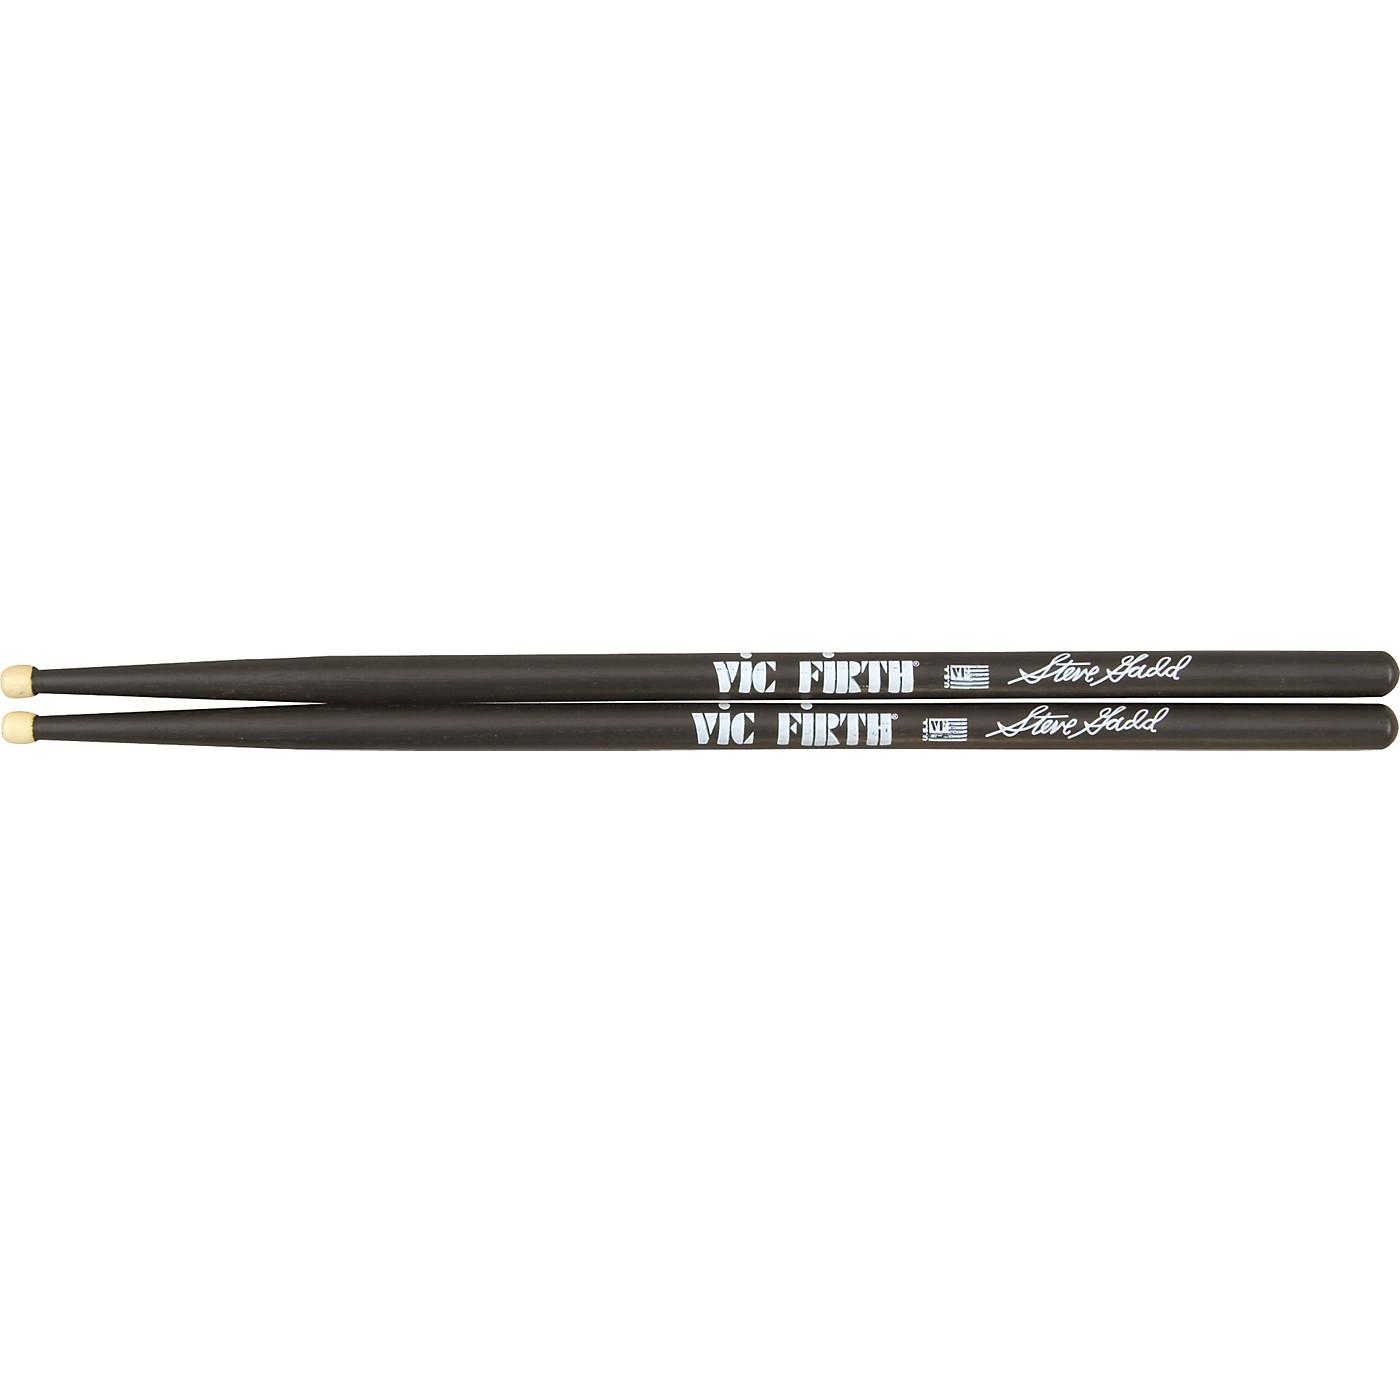 Vic Firth Steve Gadd Signature Drum Sticks thumbnail